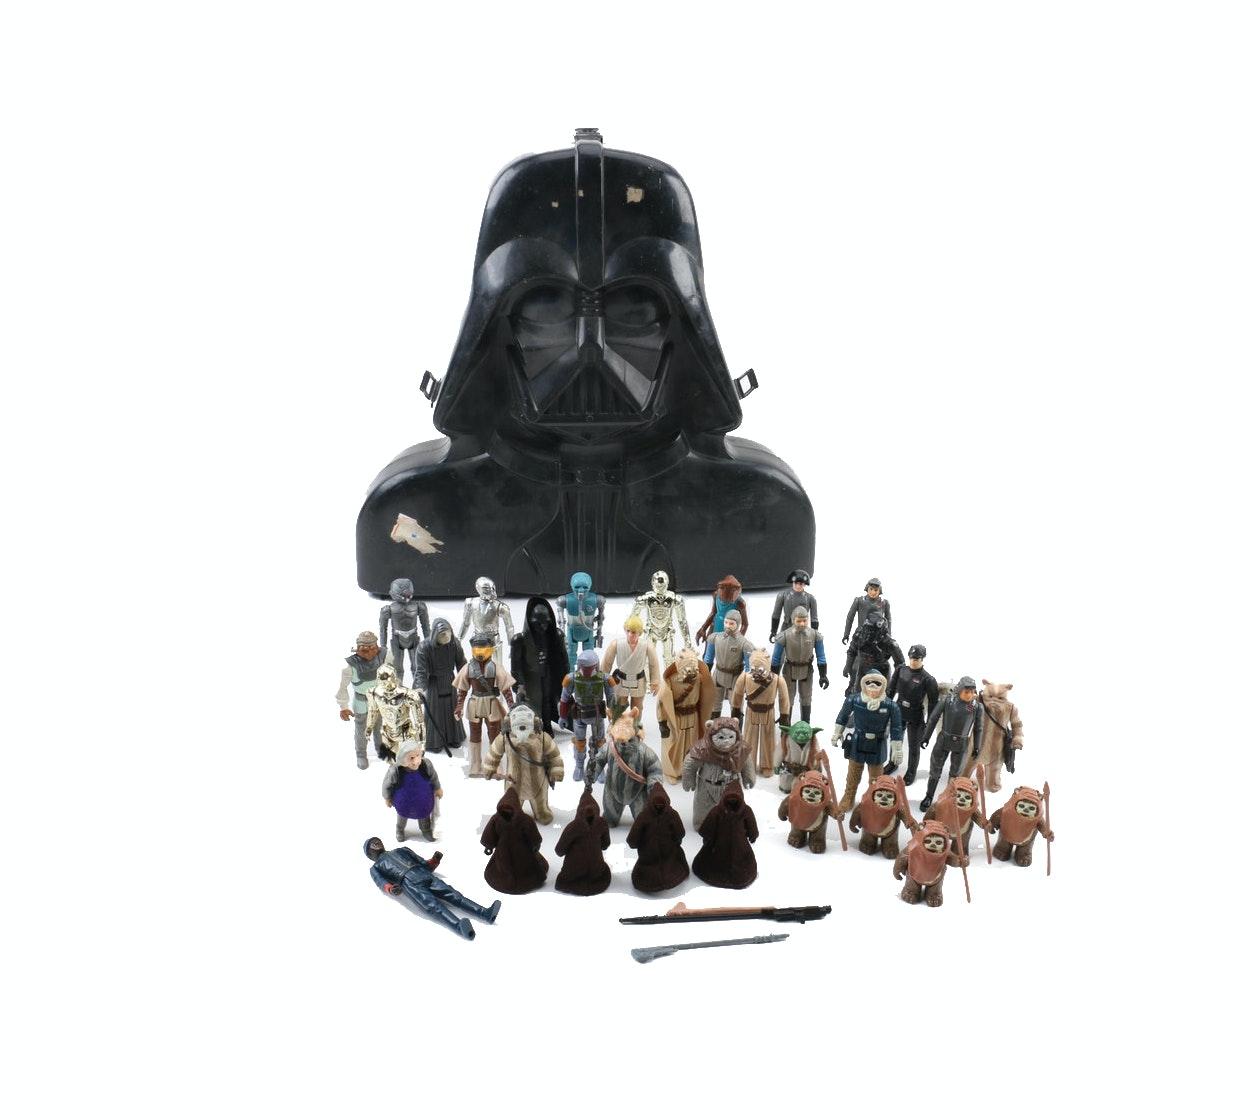 Collectibles, Toys & More